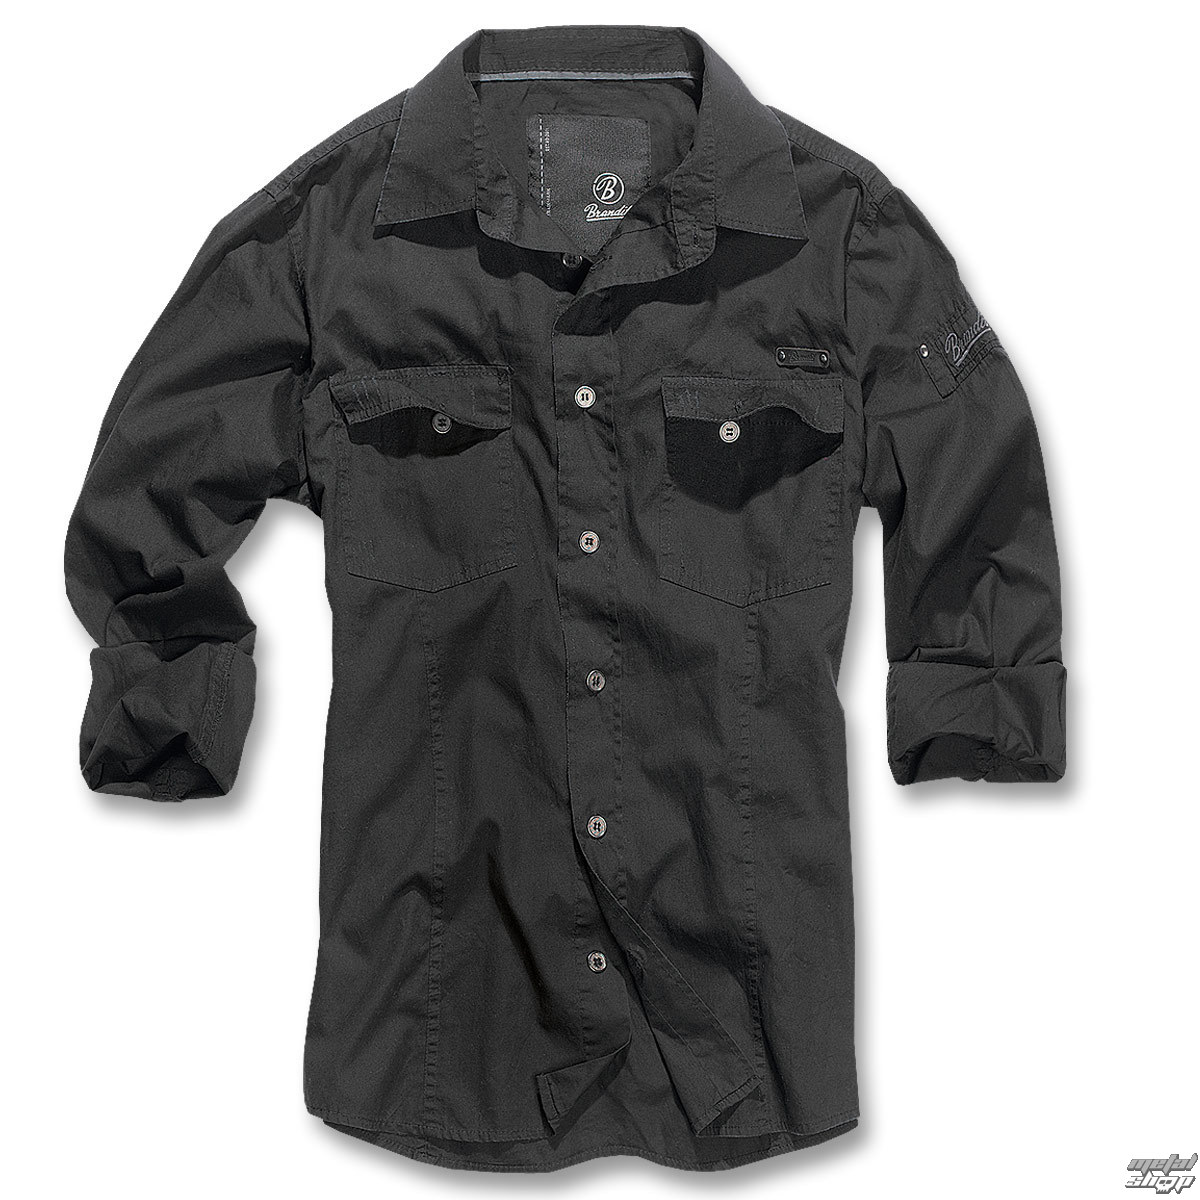 košele pánska Brandit - Men Shirt Slim - Black - 4005/2